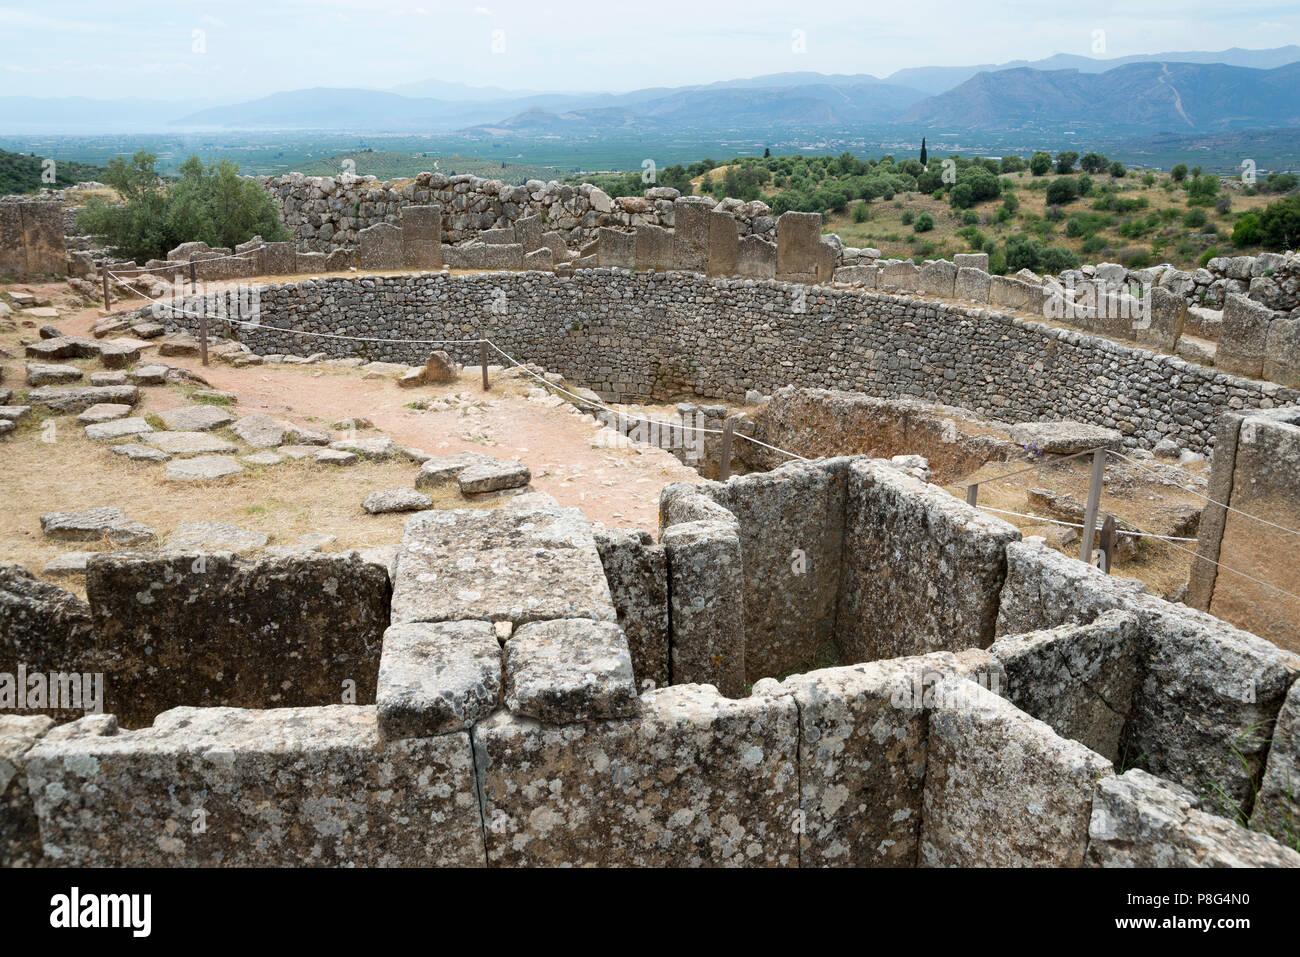 Grave Circle A, Mycenae, Argolis, Peloponnese, Greece - Stock Image